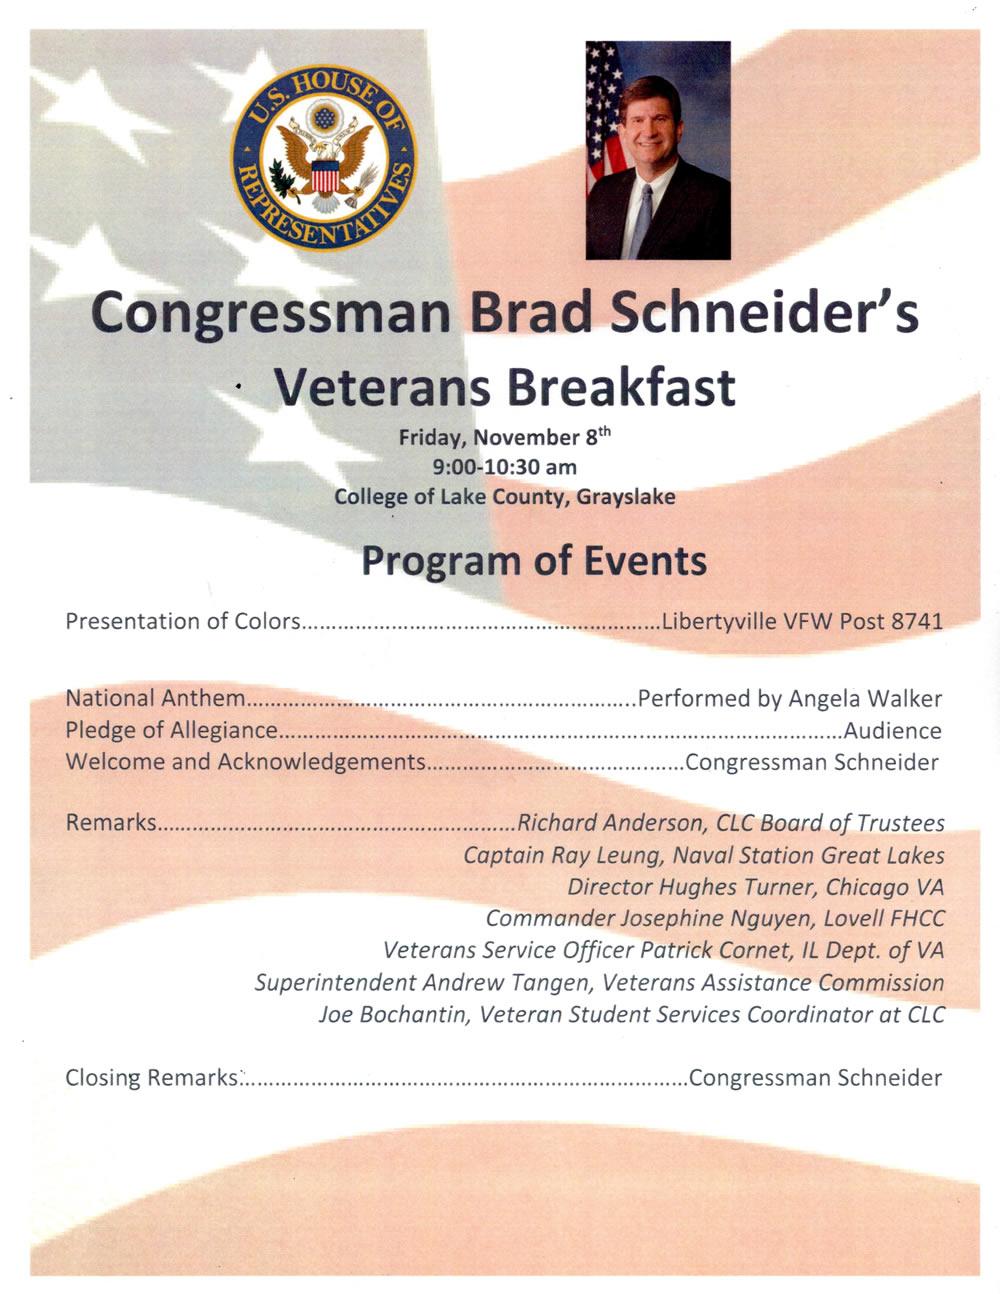 Congressman Brad Schneider's Veterans Breakfast #600Z or patriot breakfast, the image of the program of events by artist Stephen F. Condren.